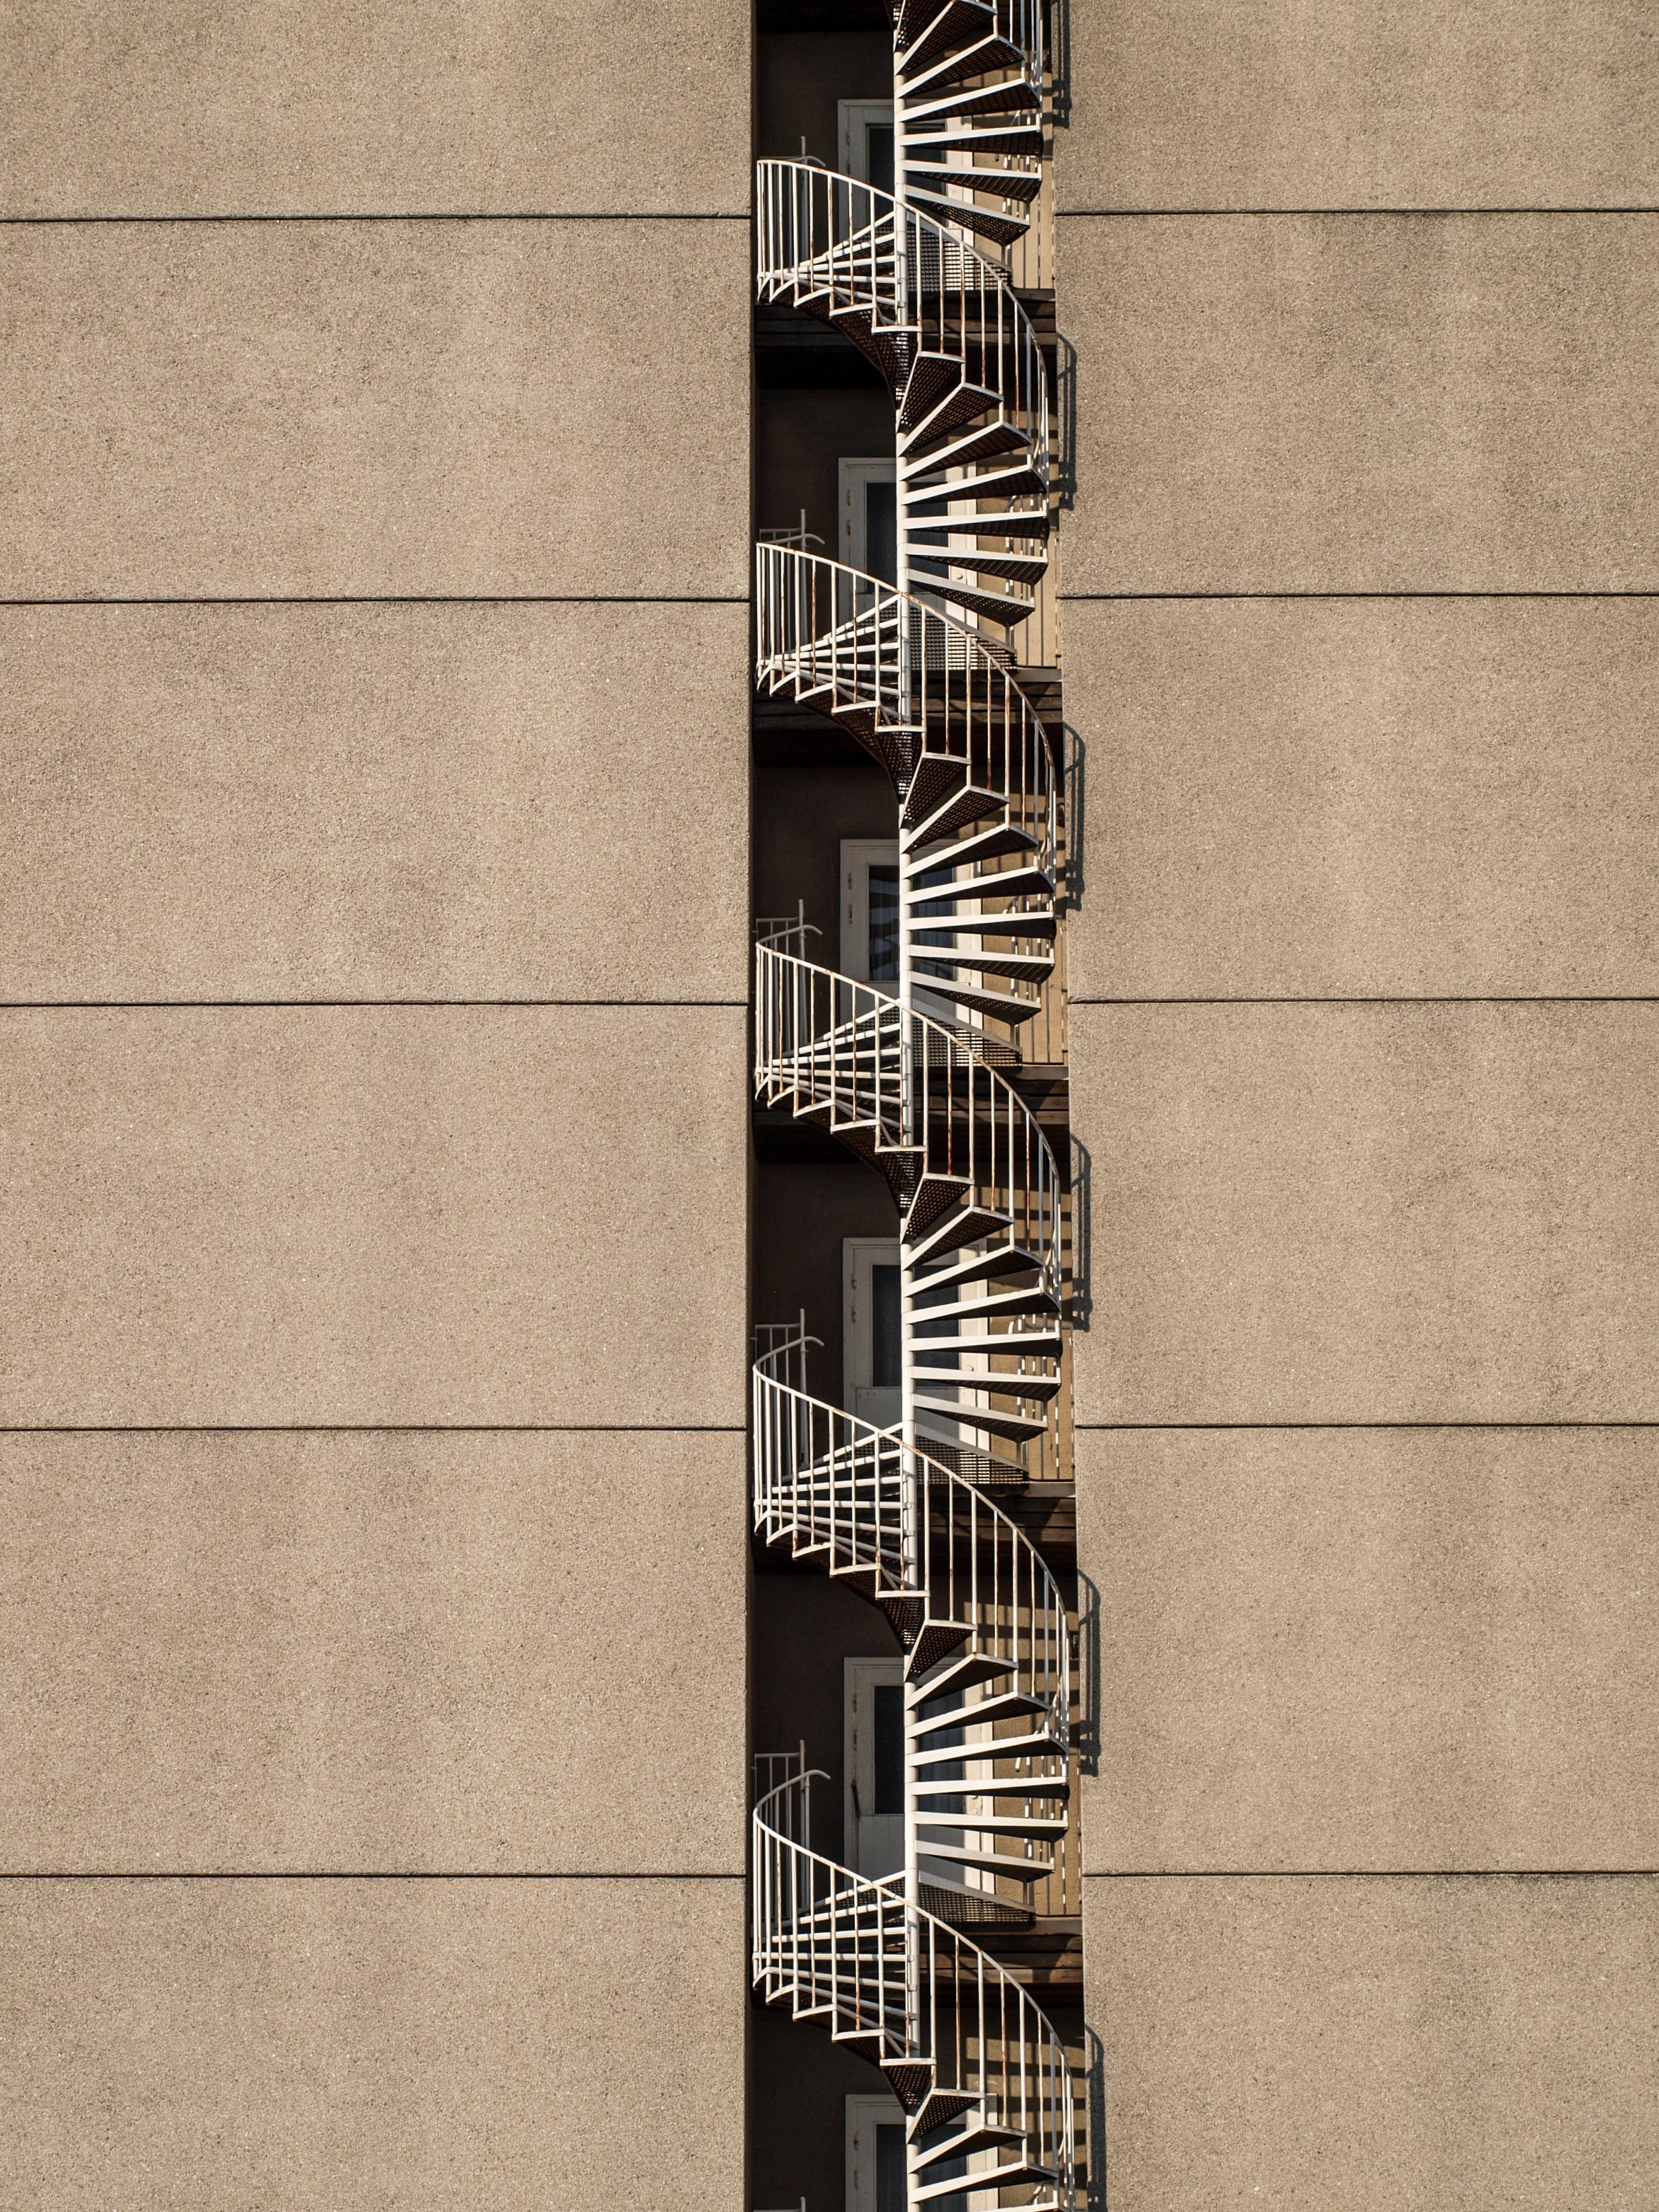 Fotos gratis : arquitectura, estructura, madera, espiral, antiguo ...